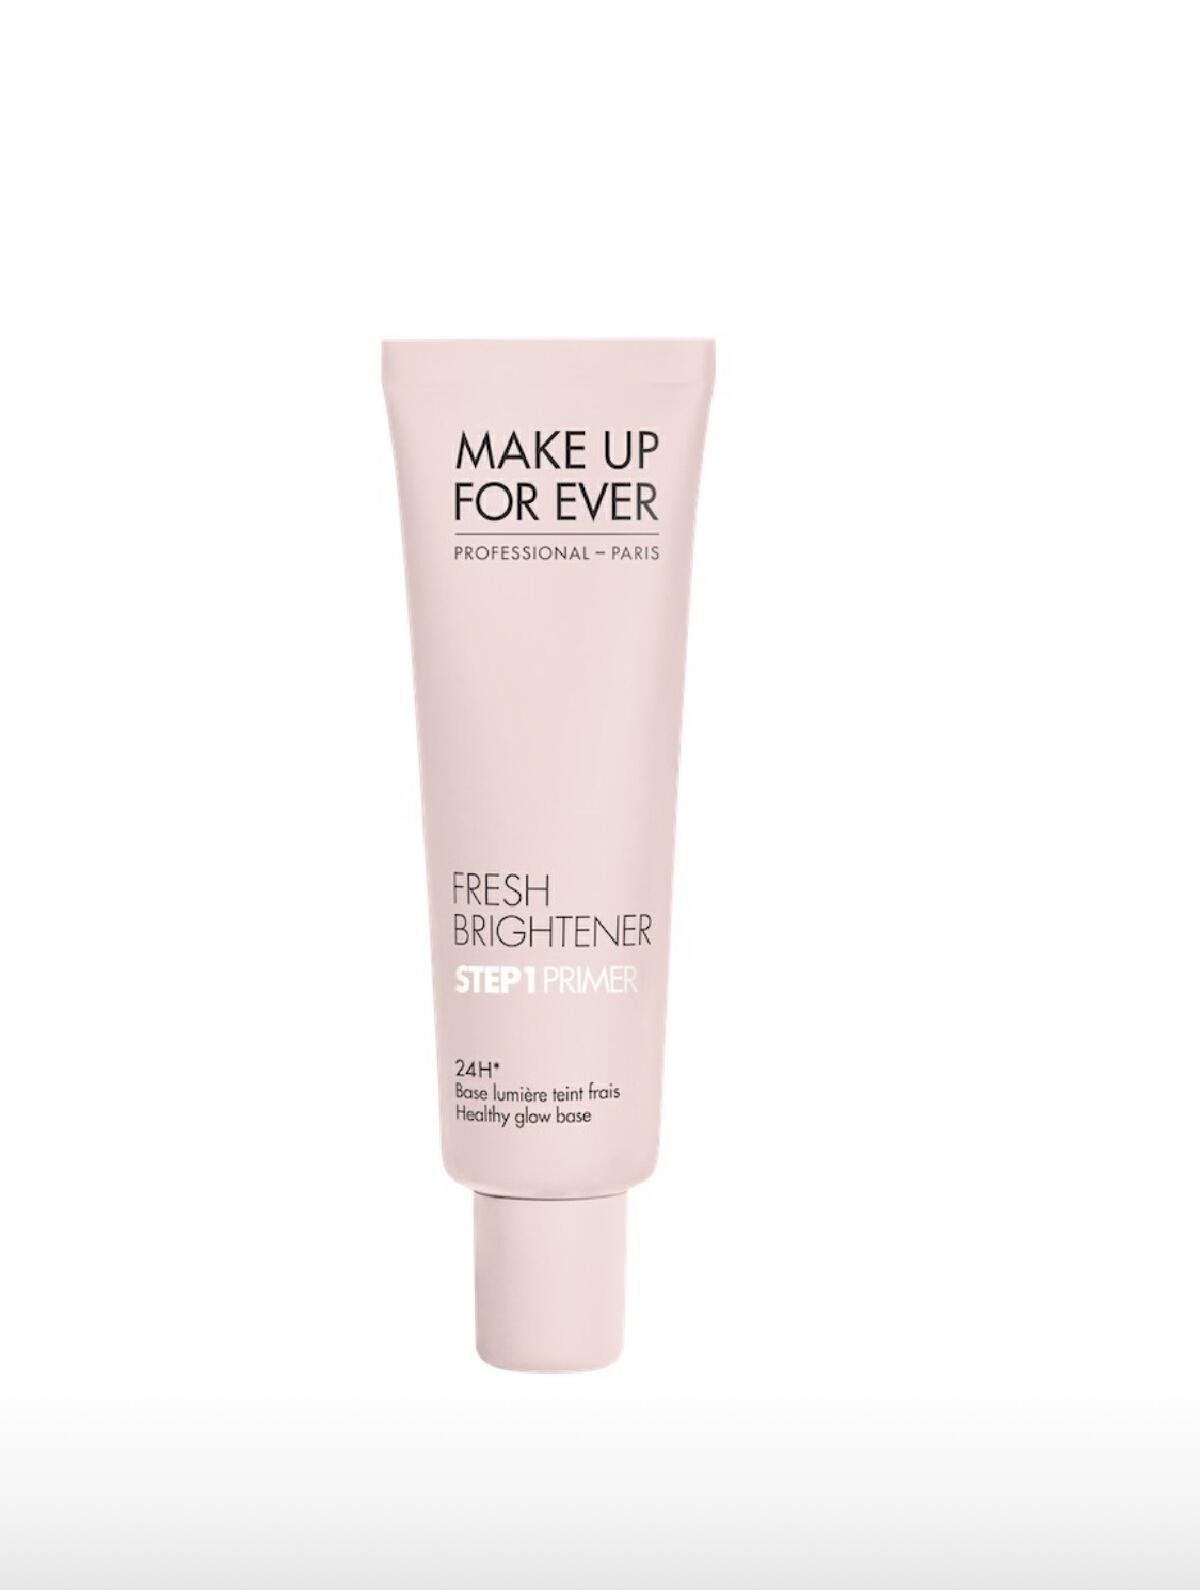 Make Up For Ever Step 1 Primer Fresh Brightener